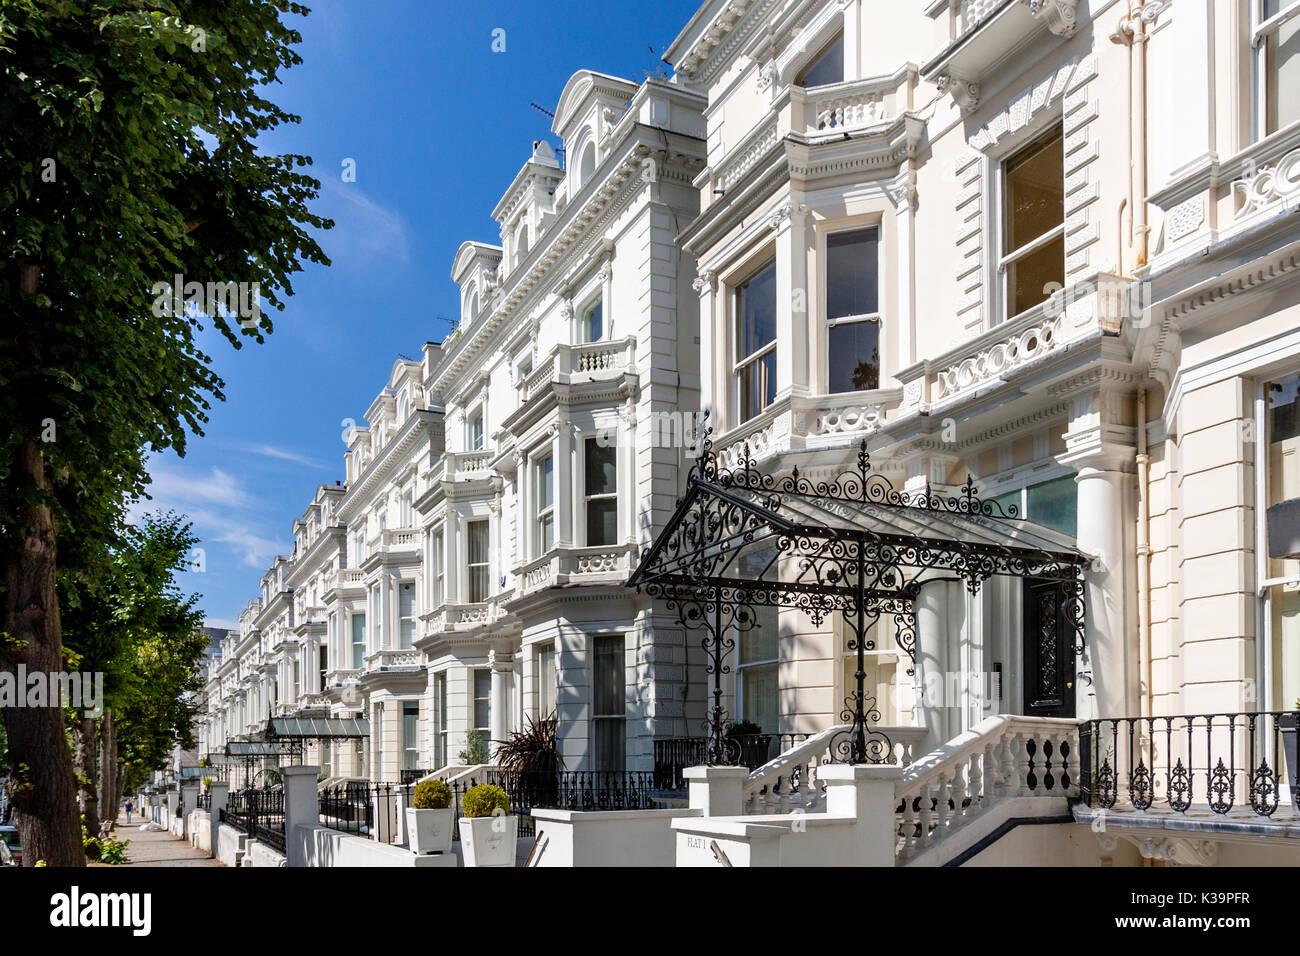 Expensive Property, Holland Park, London, UK - Stock Image